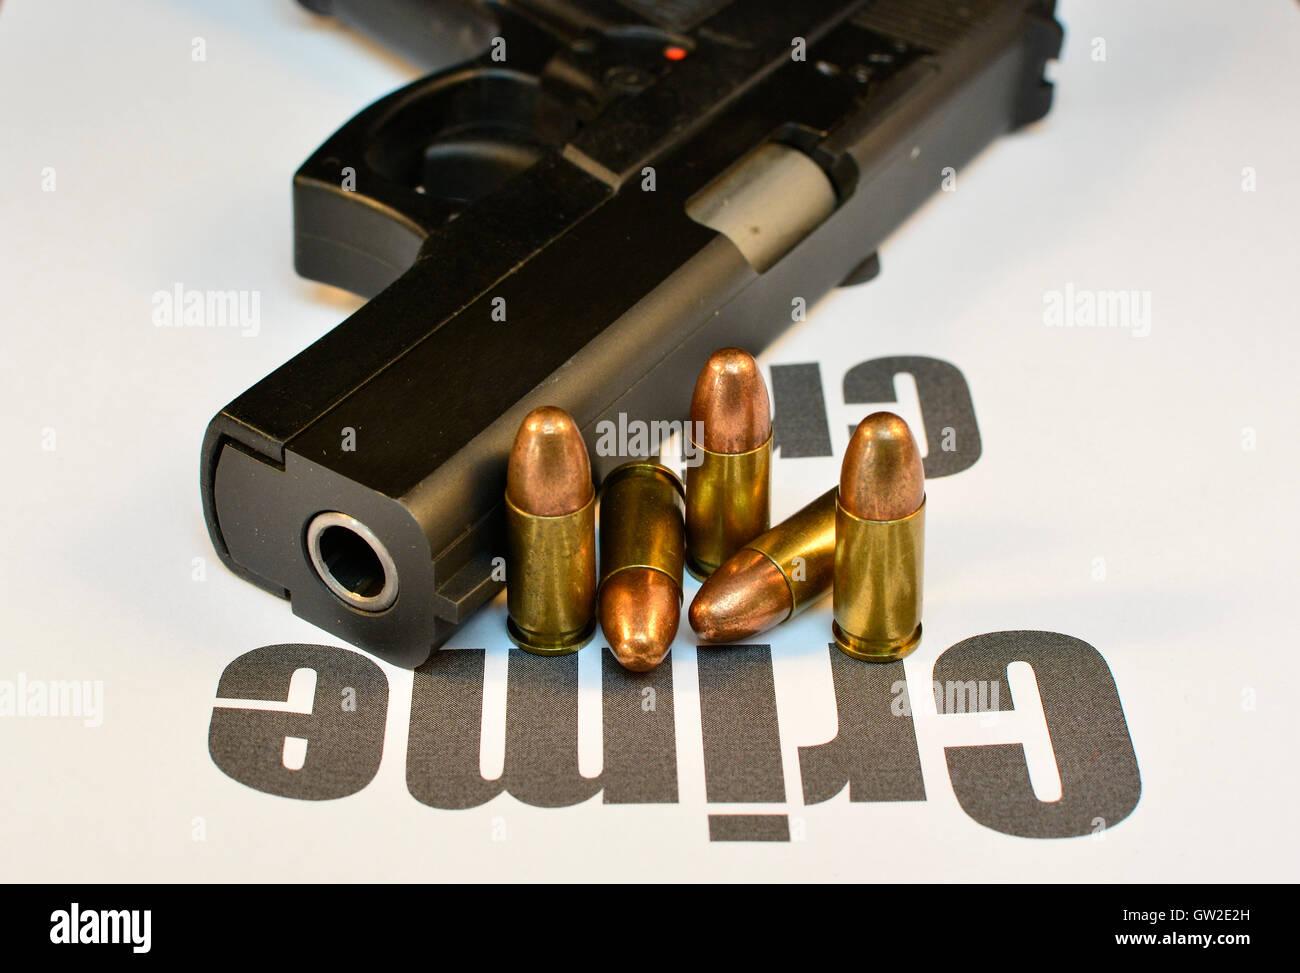 Concepto del delito. Pistola con balas de pistola, crimen violento asalto. Disparar. Imagen De Stock